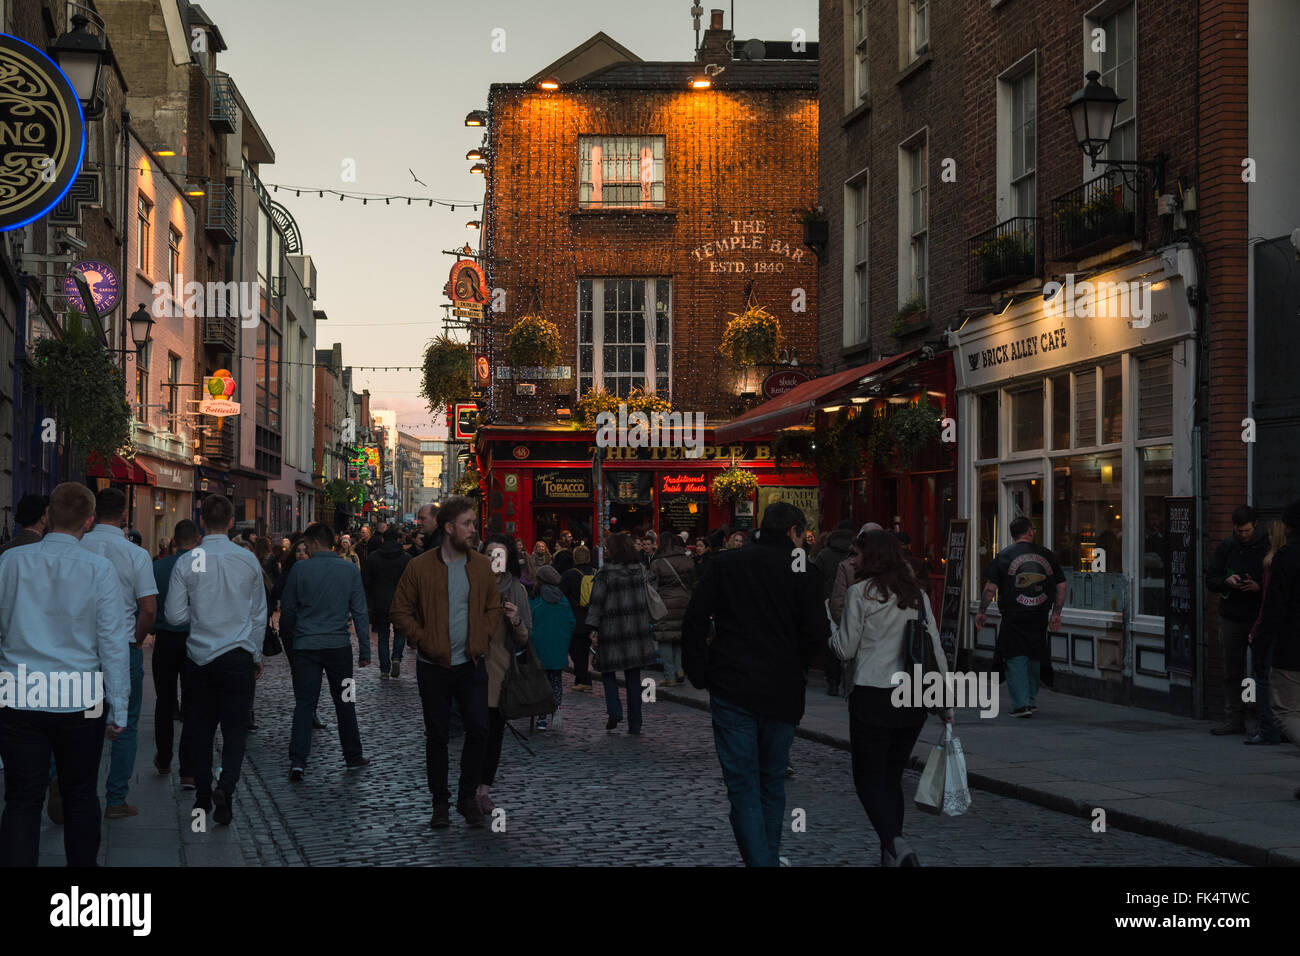 Temple Bar, Dublin, Ireland early evening - Stock Image